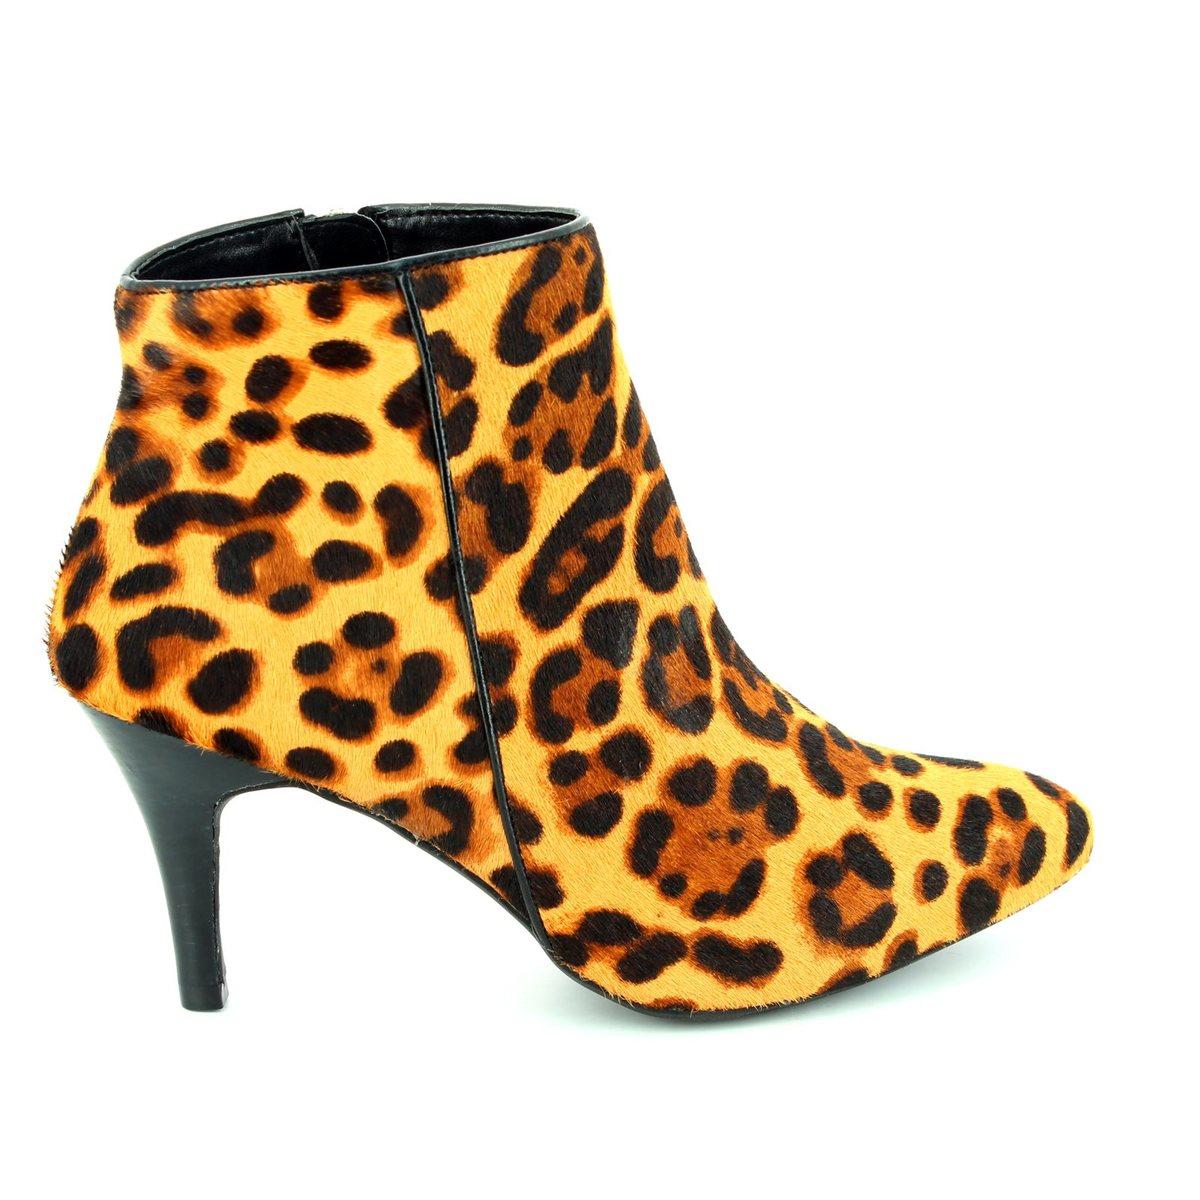 6fcfbcfd517 Lotus Ankle Boots - Leopard print - 40256 20 BLUMA